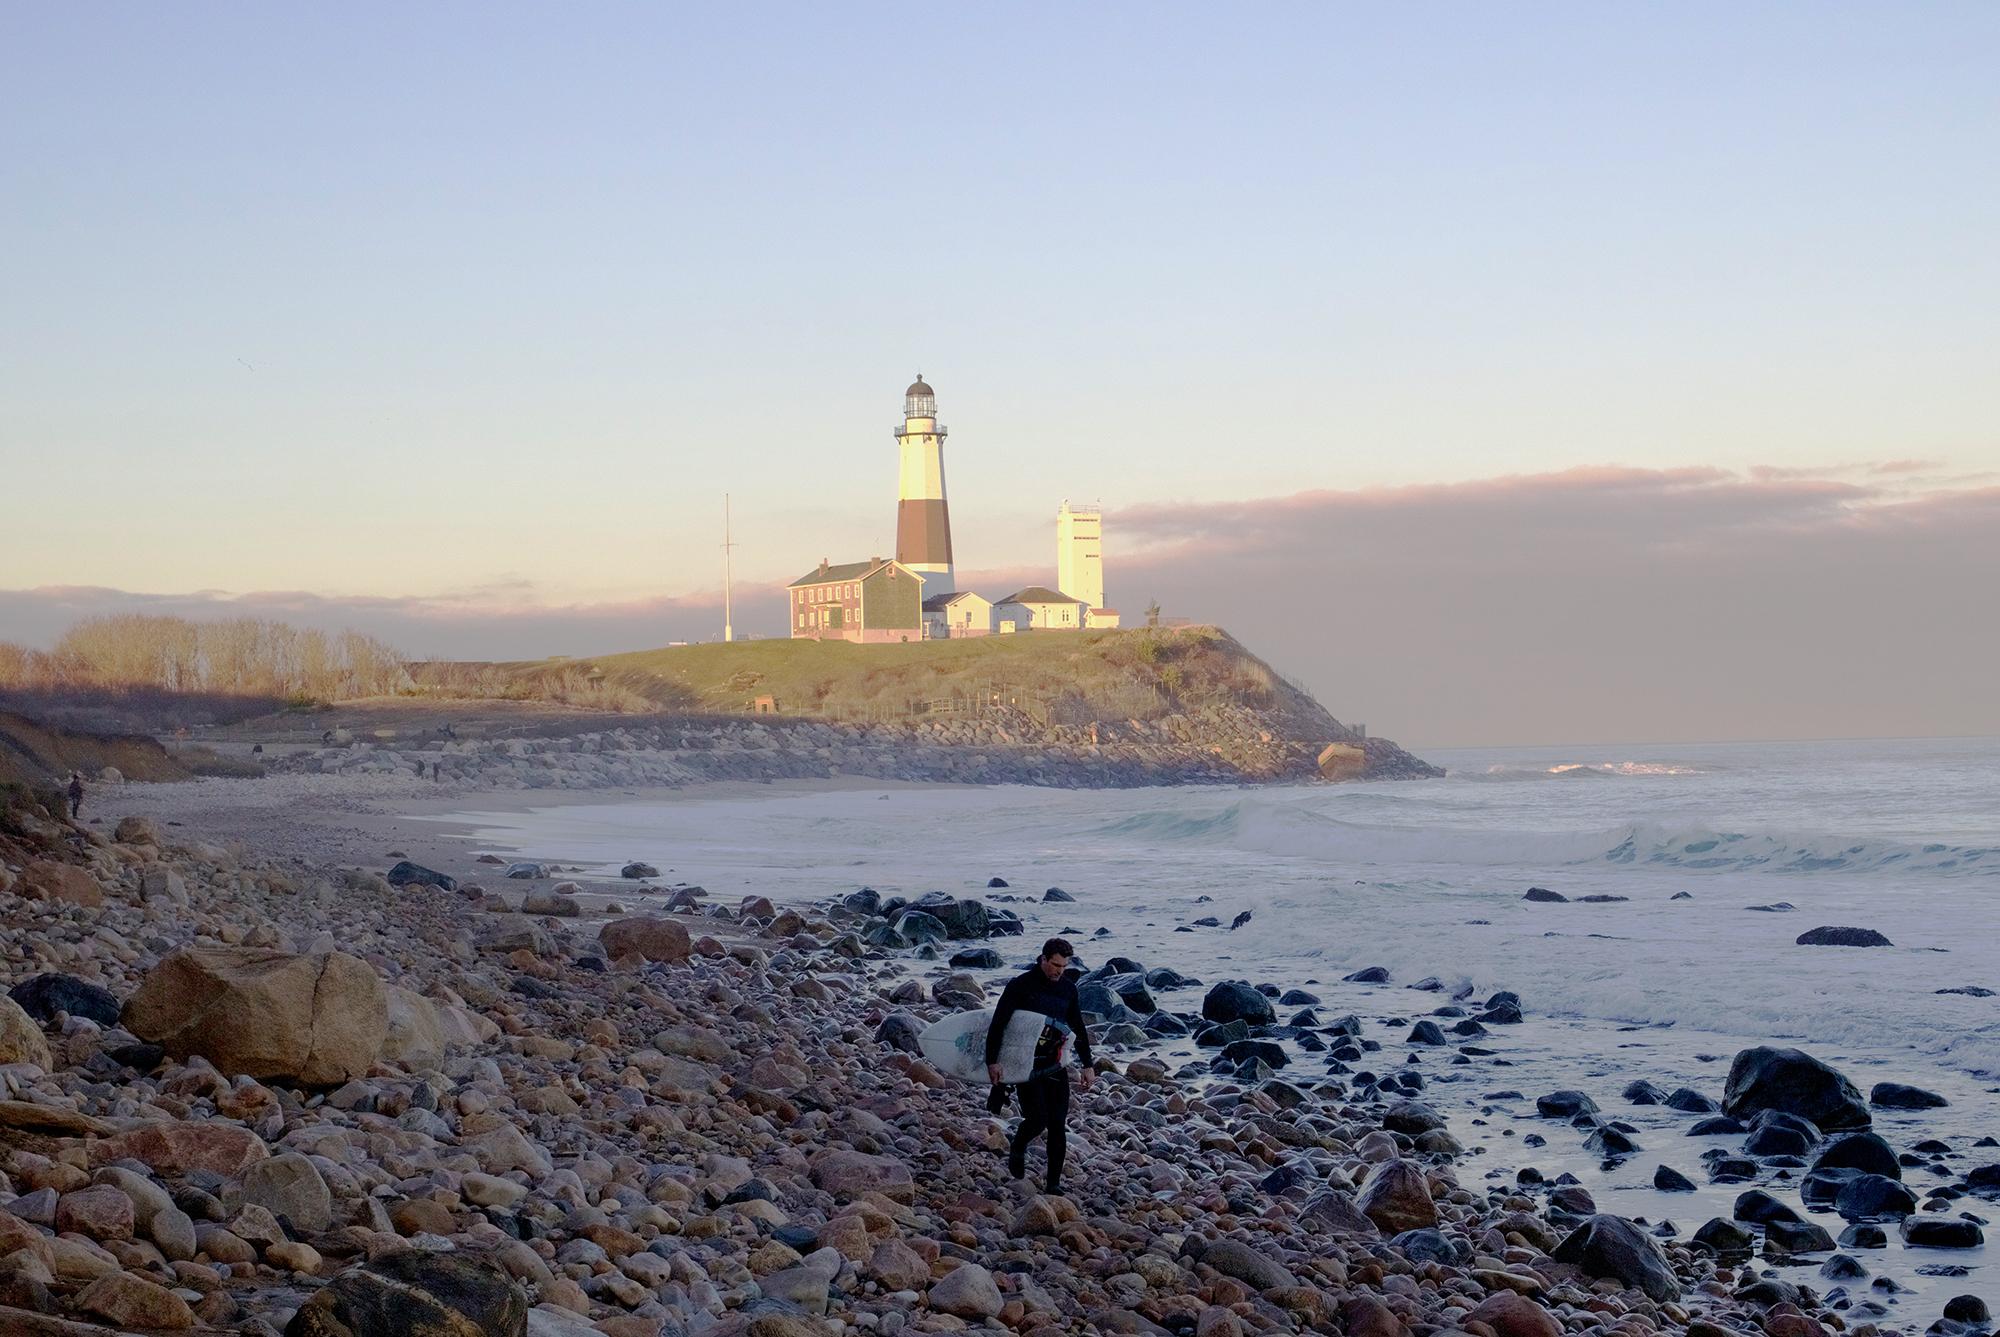 1-19-17 MTK Lighthouse.jpg